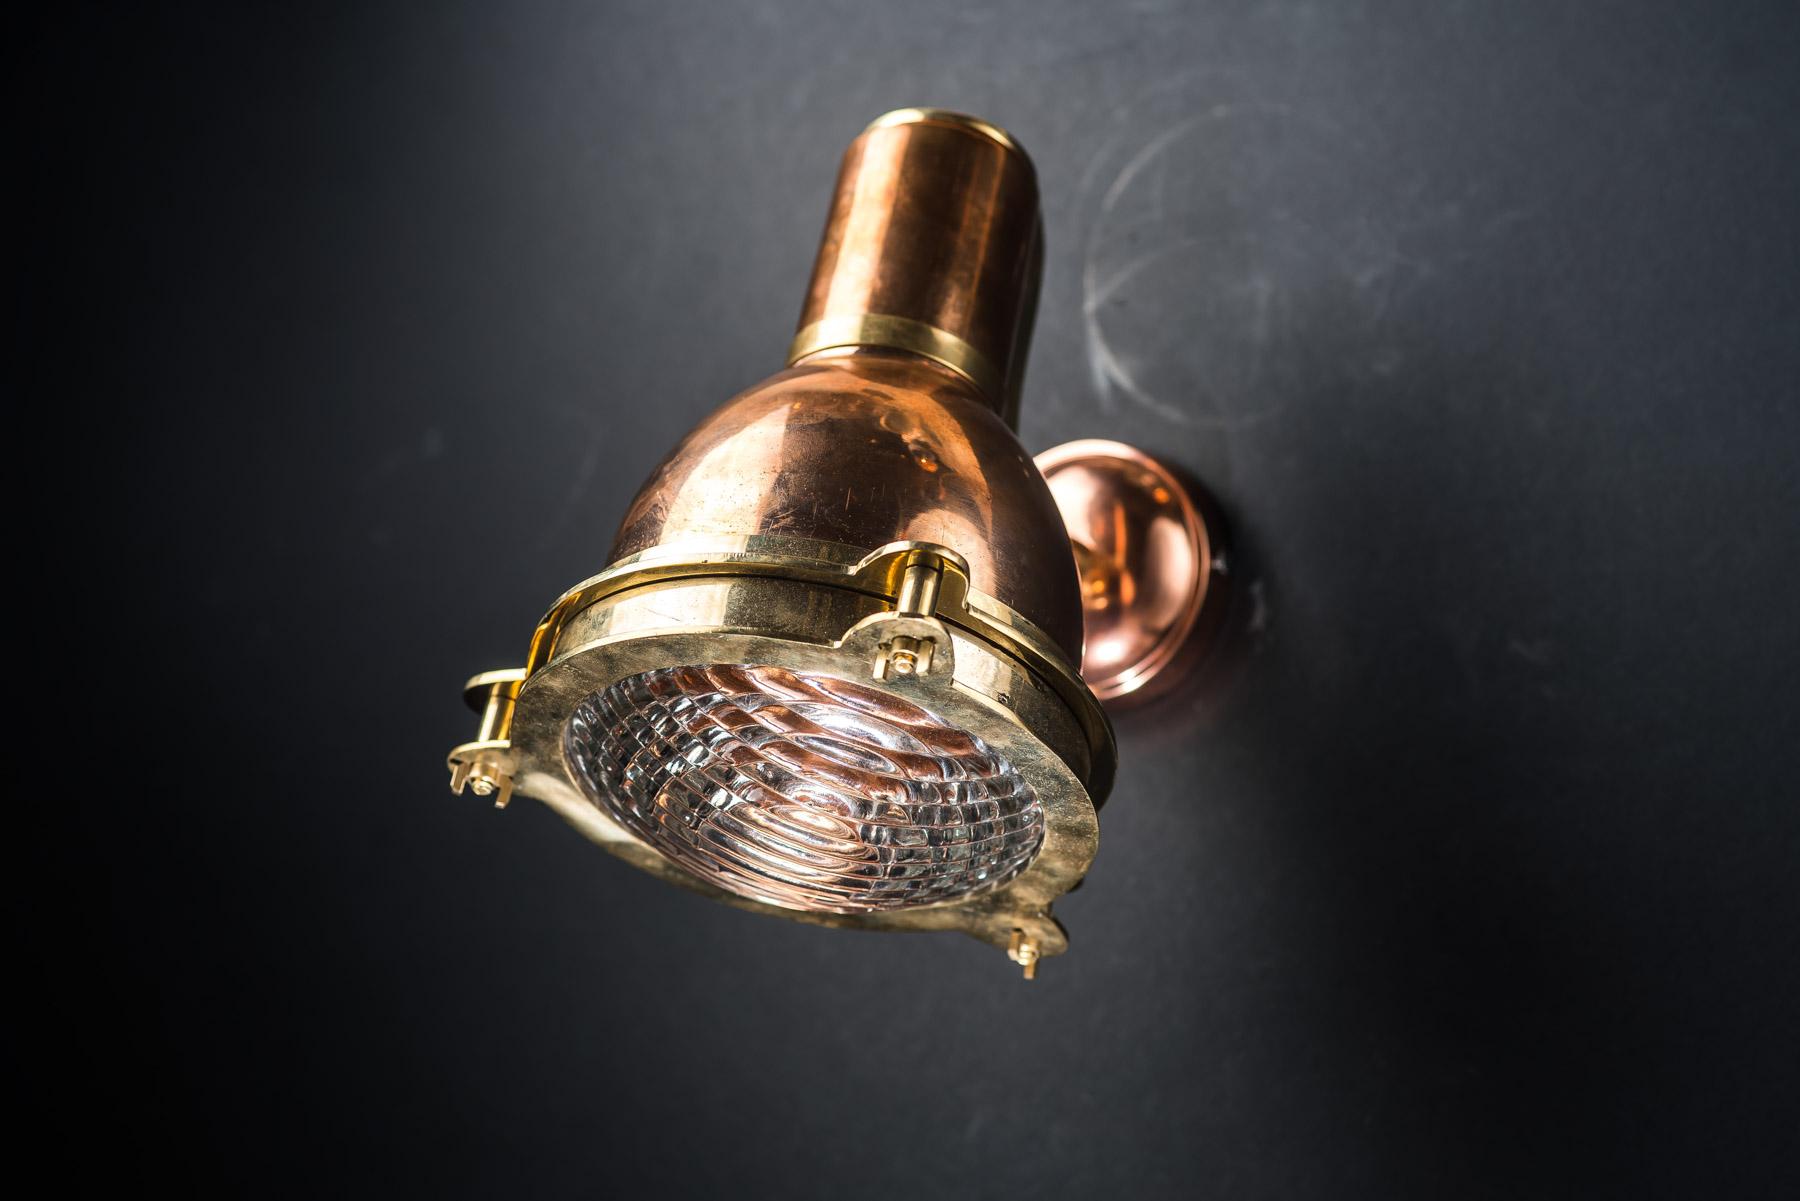 Copper-and-brass-wall-light.jpg